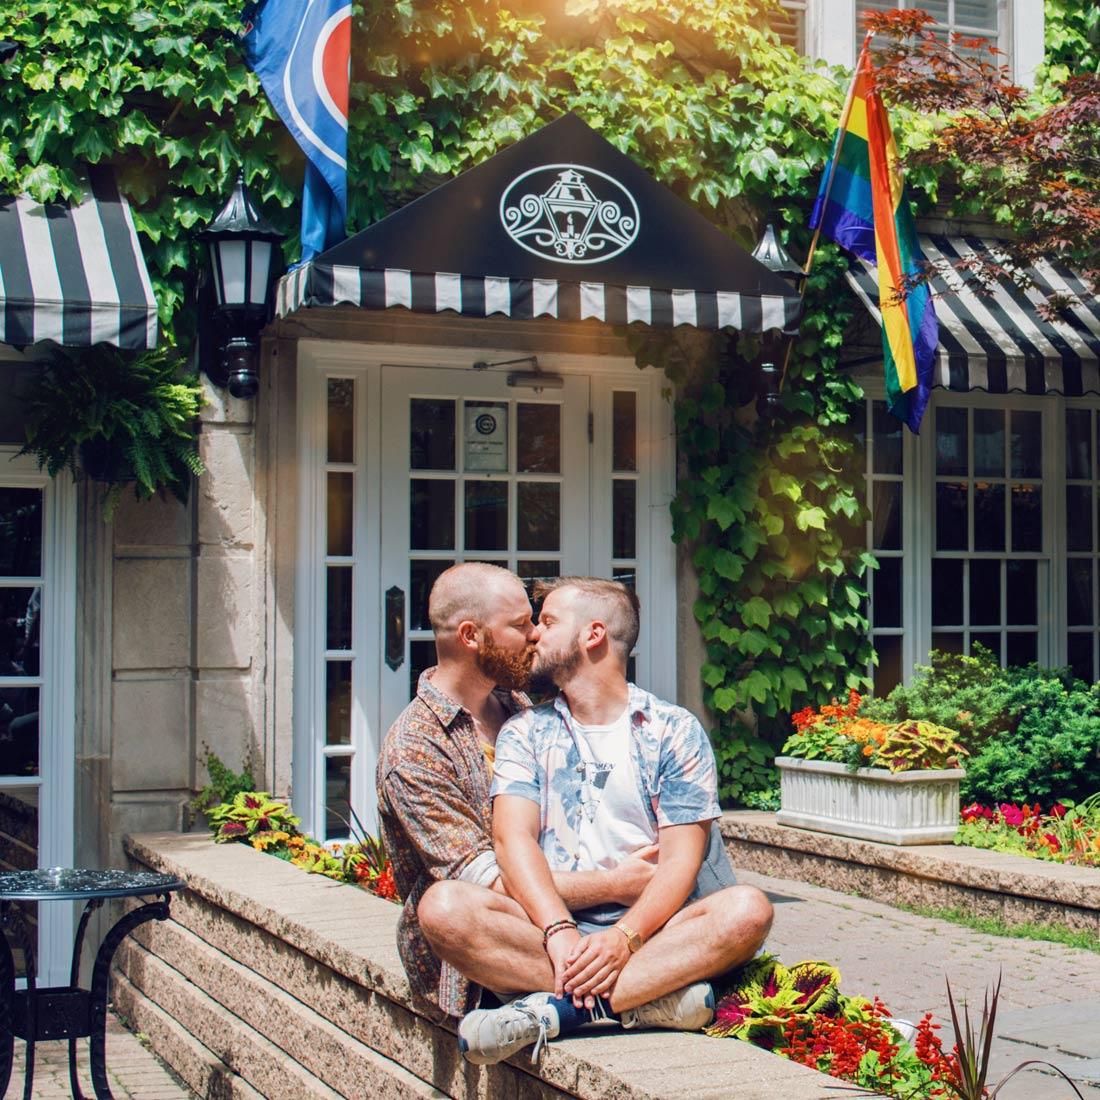 Chicago Gay City Tipps Gay-friendly Best Western Plus Hawthorne Terrace Hotel Boystown © Coupleofmen.com